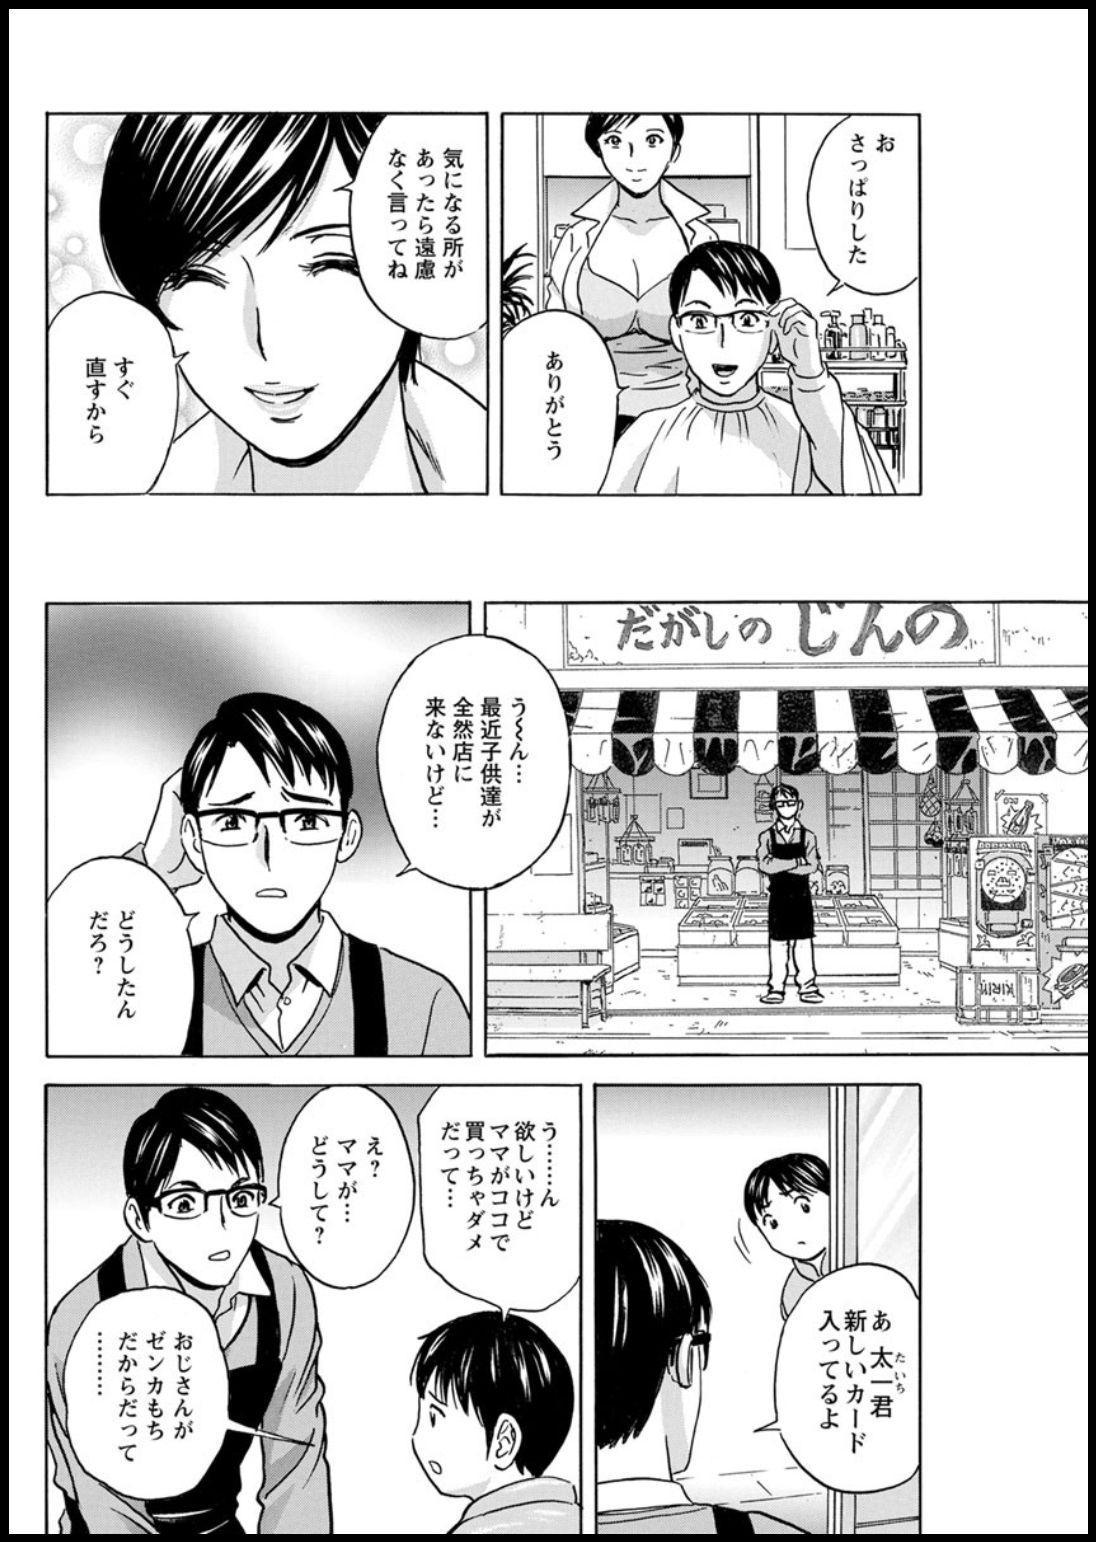 [Hidemaru] Yurase Bikyonyuu! Hataraku J-Cup Ch. 1-5 [Digital] 79